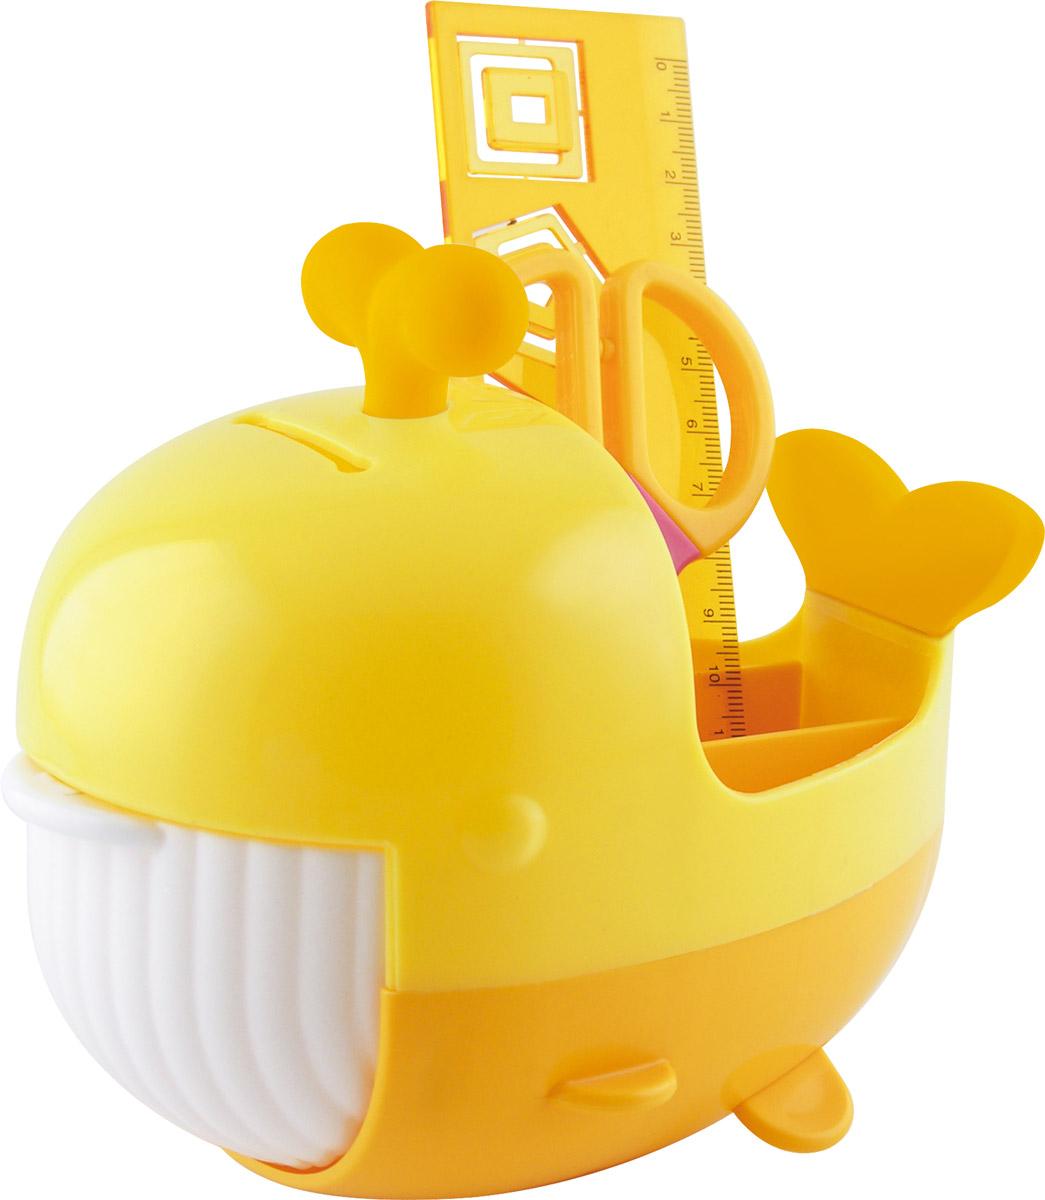 Brauberg Канцелярский набор Кит цвет желтый оранжевый 4 предмета